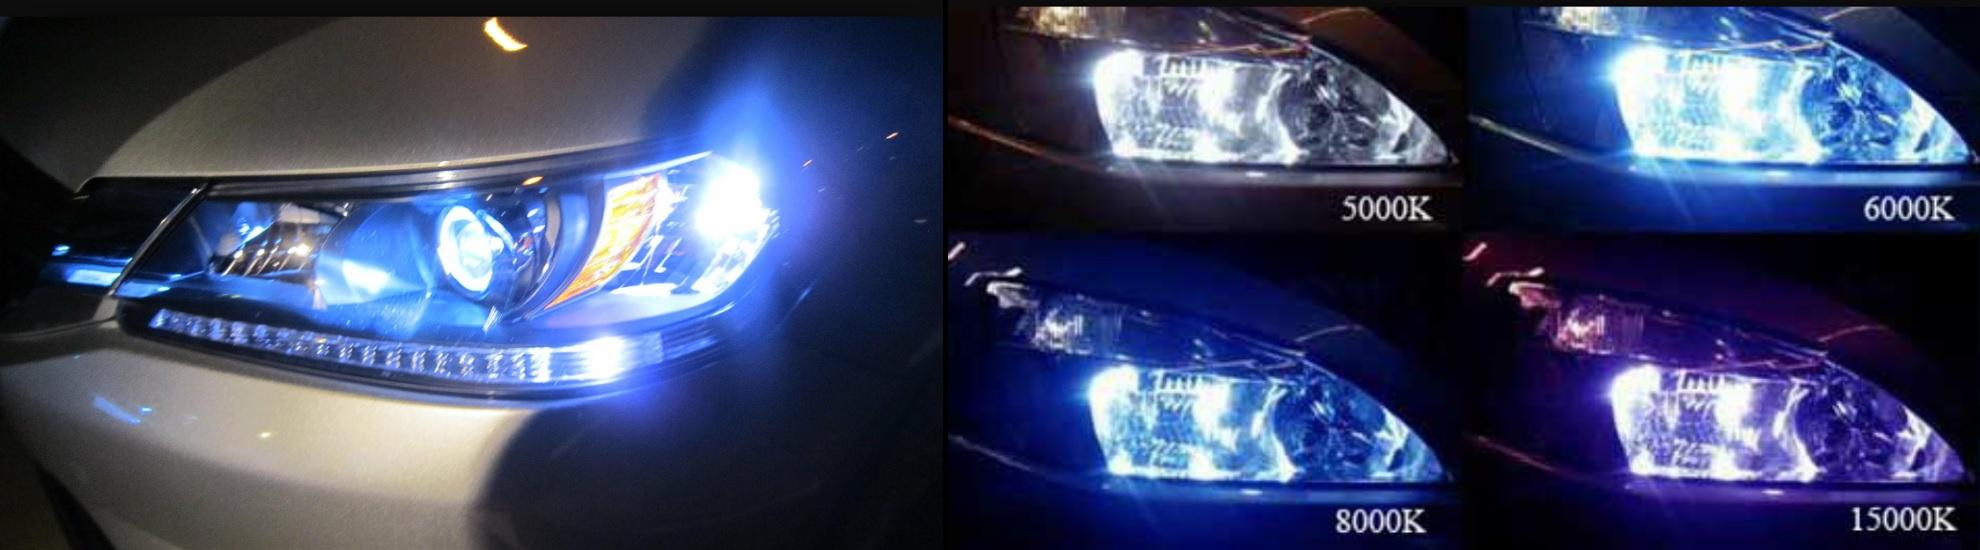 forum xenon view viewtopic headlights pcoa topic lights proper lighting